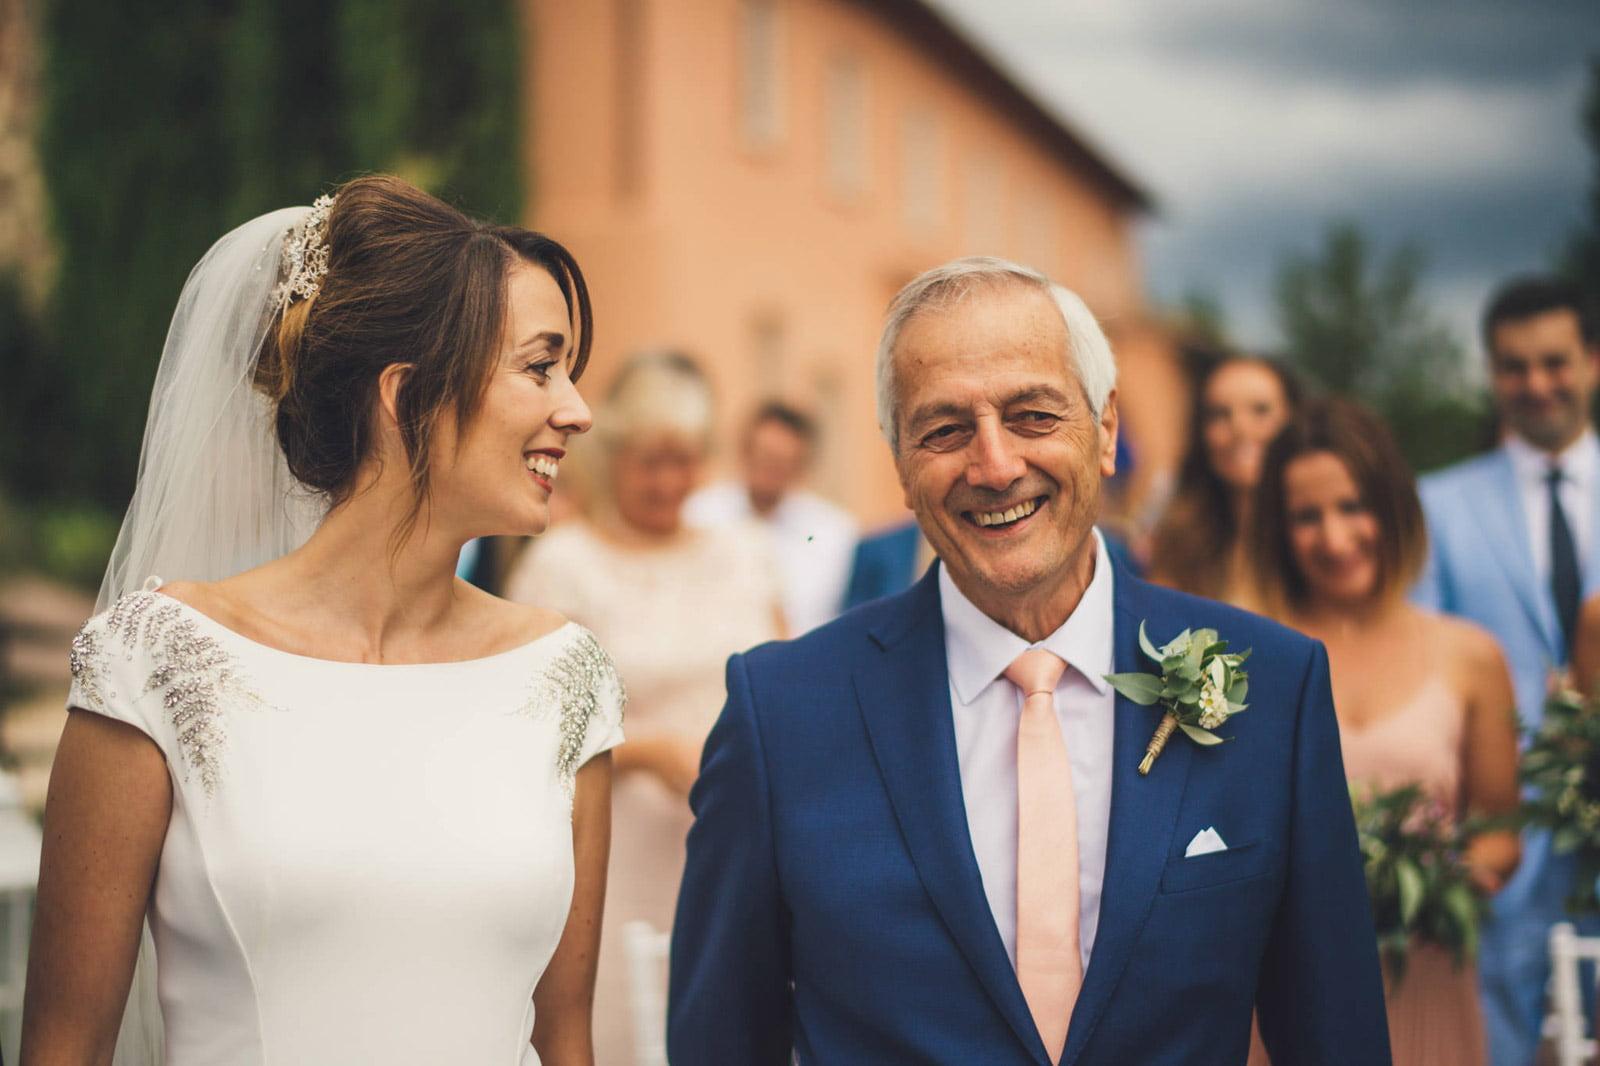 047-wedding-tuscany-san-galgano-federico-pannacci-photographer